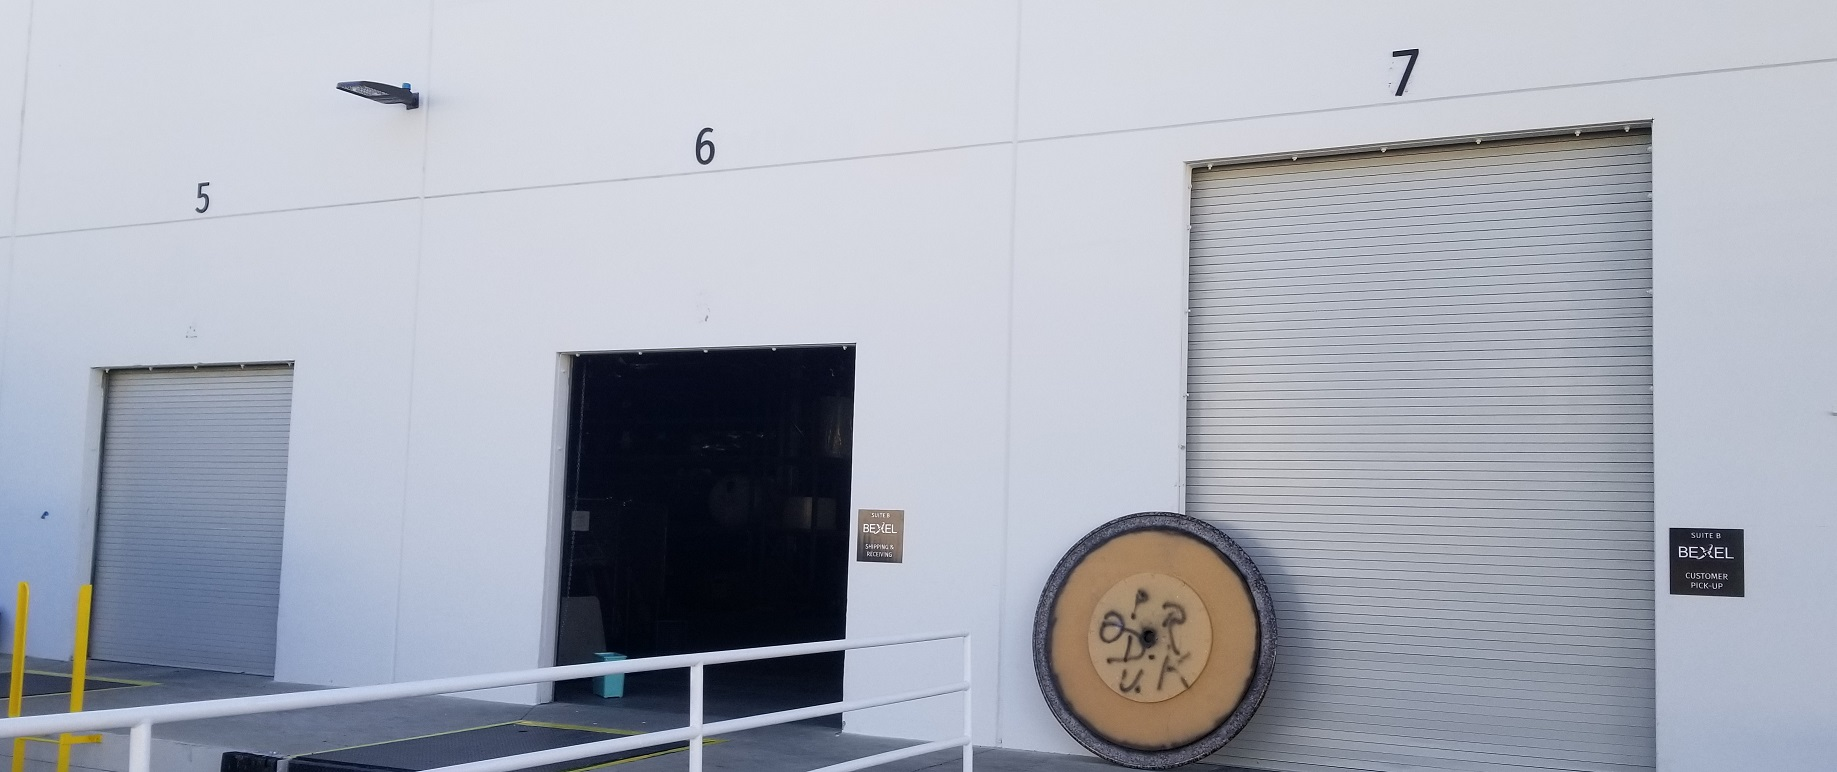 Door ID Signs, Laser Cut Acrylic, Roll Up Door Signs Los Angeles, Cargo Loading Sign Company, Bexel Sign San Fernando Valley, Sign Makers Los Angeles, Premium Sign Solutions San Fernando Valley.